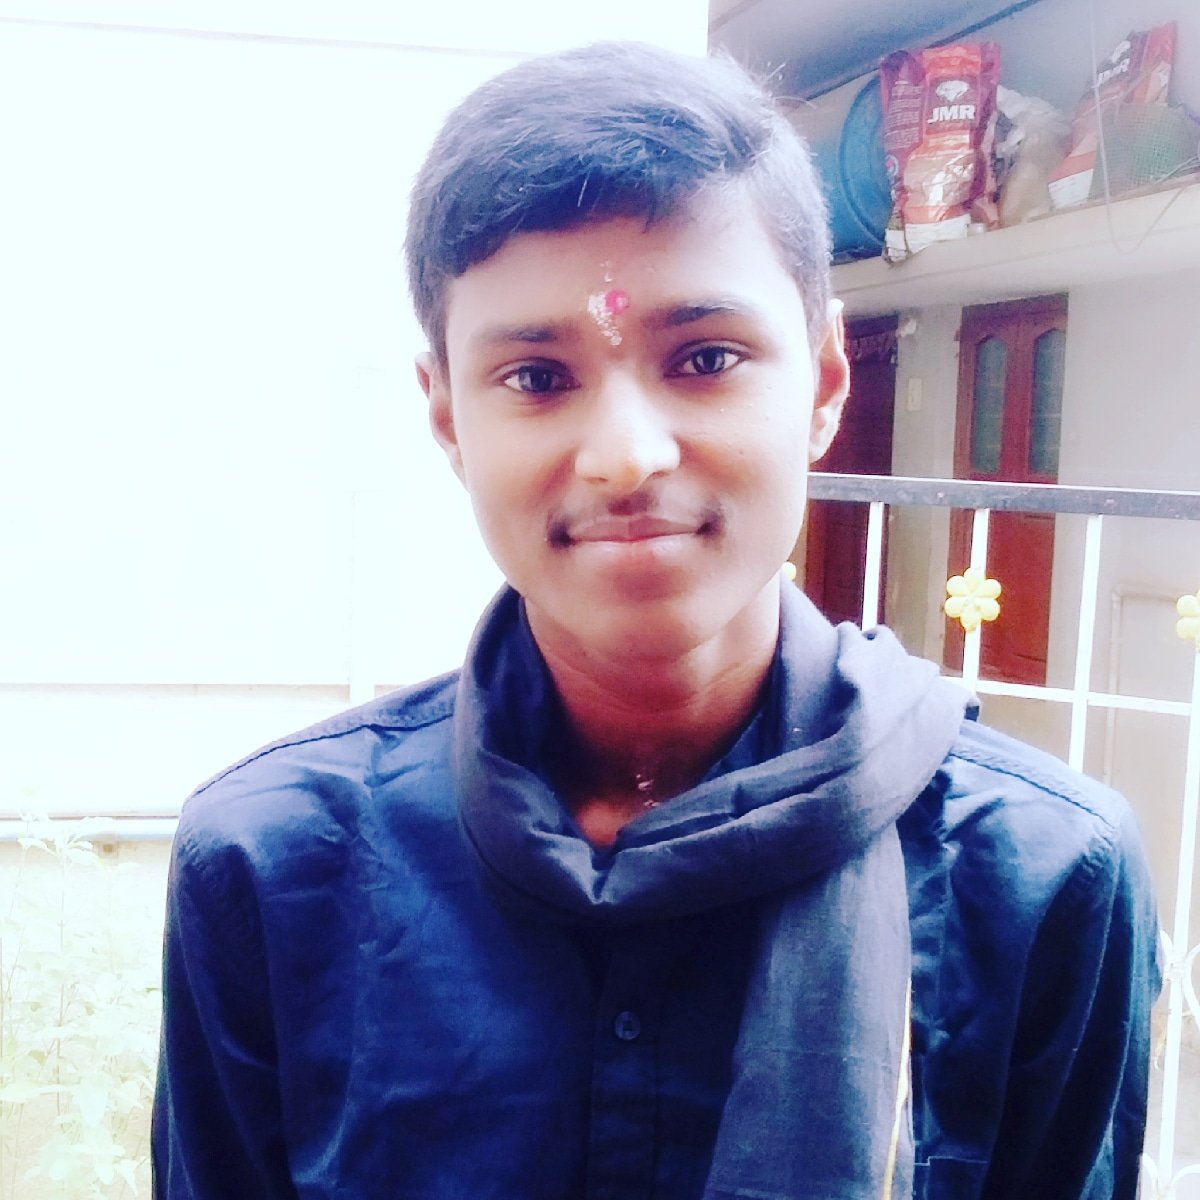 #AlwaysJaiChandra #ramcharanfans #saidharamtejfans #poojahegdefans #swamysaranamayyappapic.twitter.com/KN0cKs4SI9